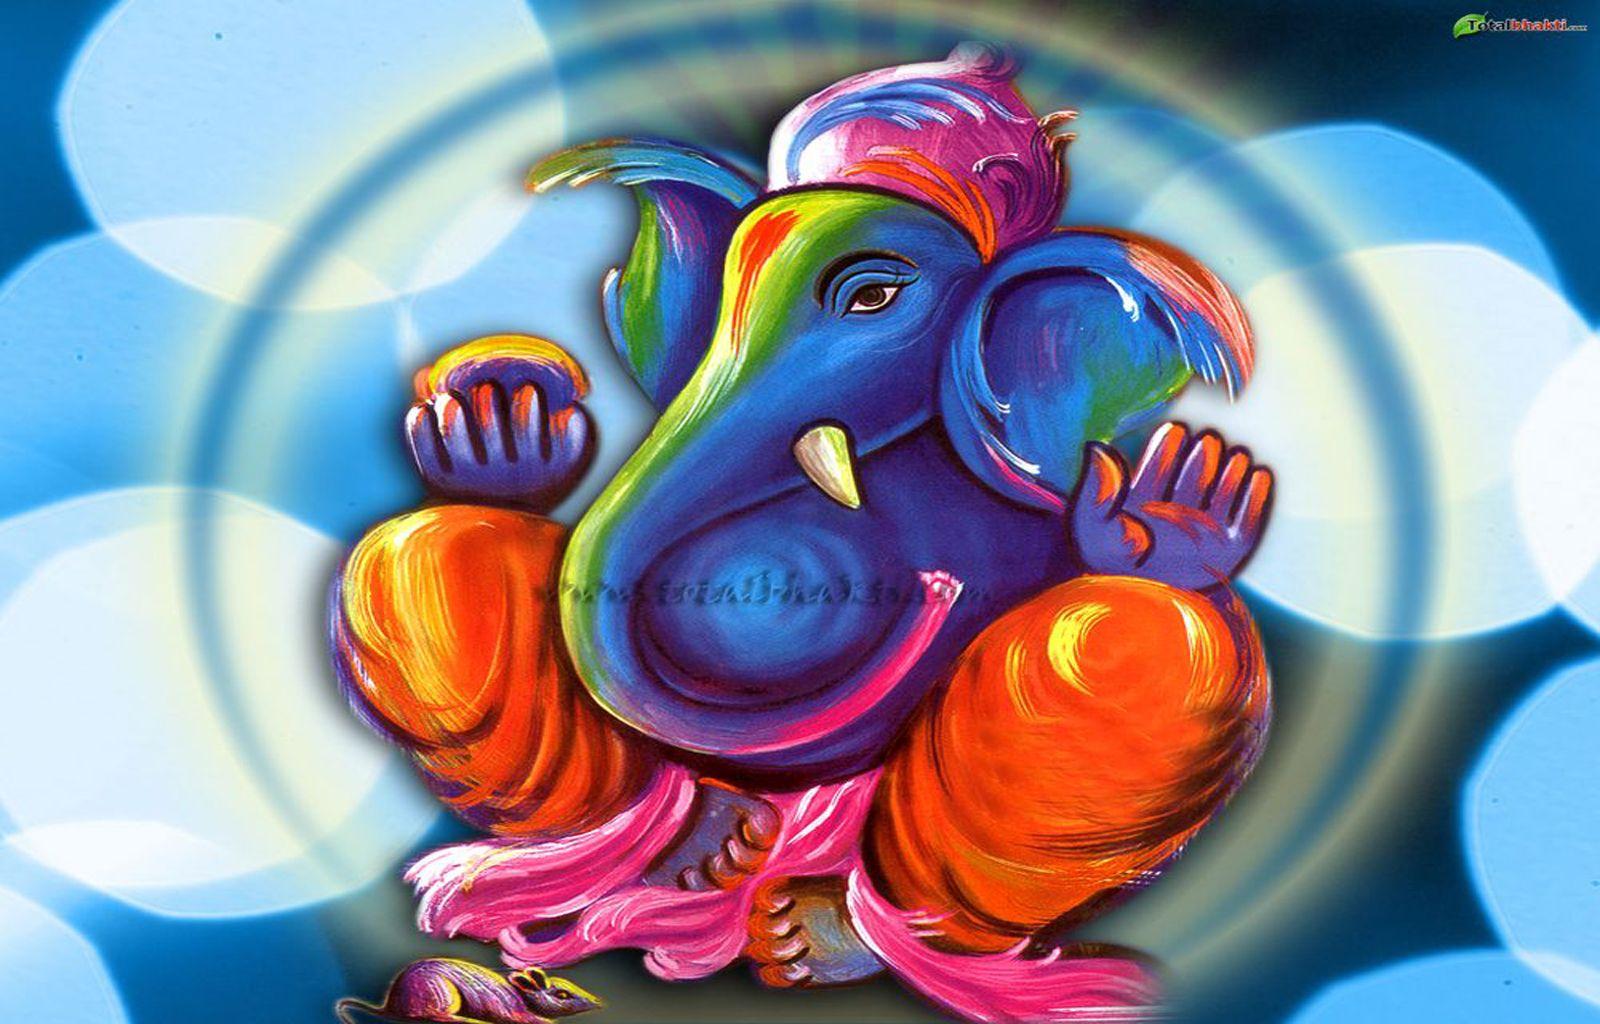 Wallpaper download ganesh - Ganesha